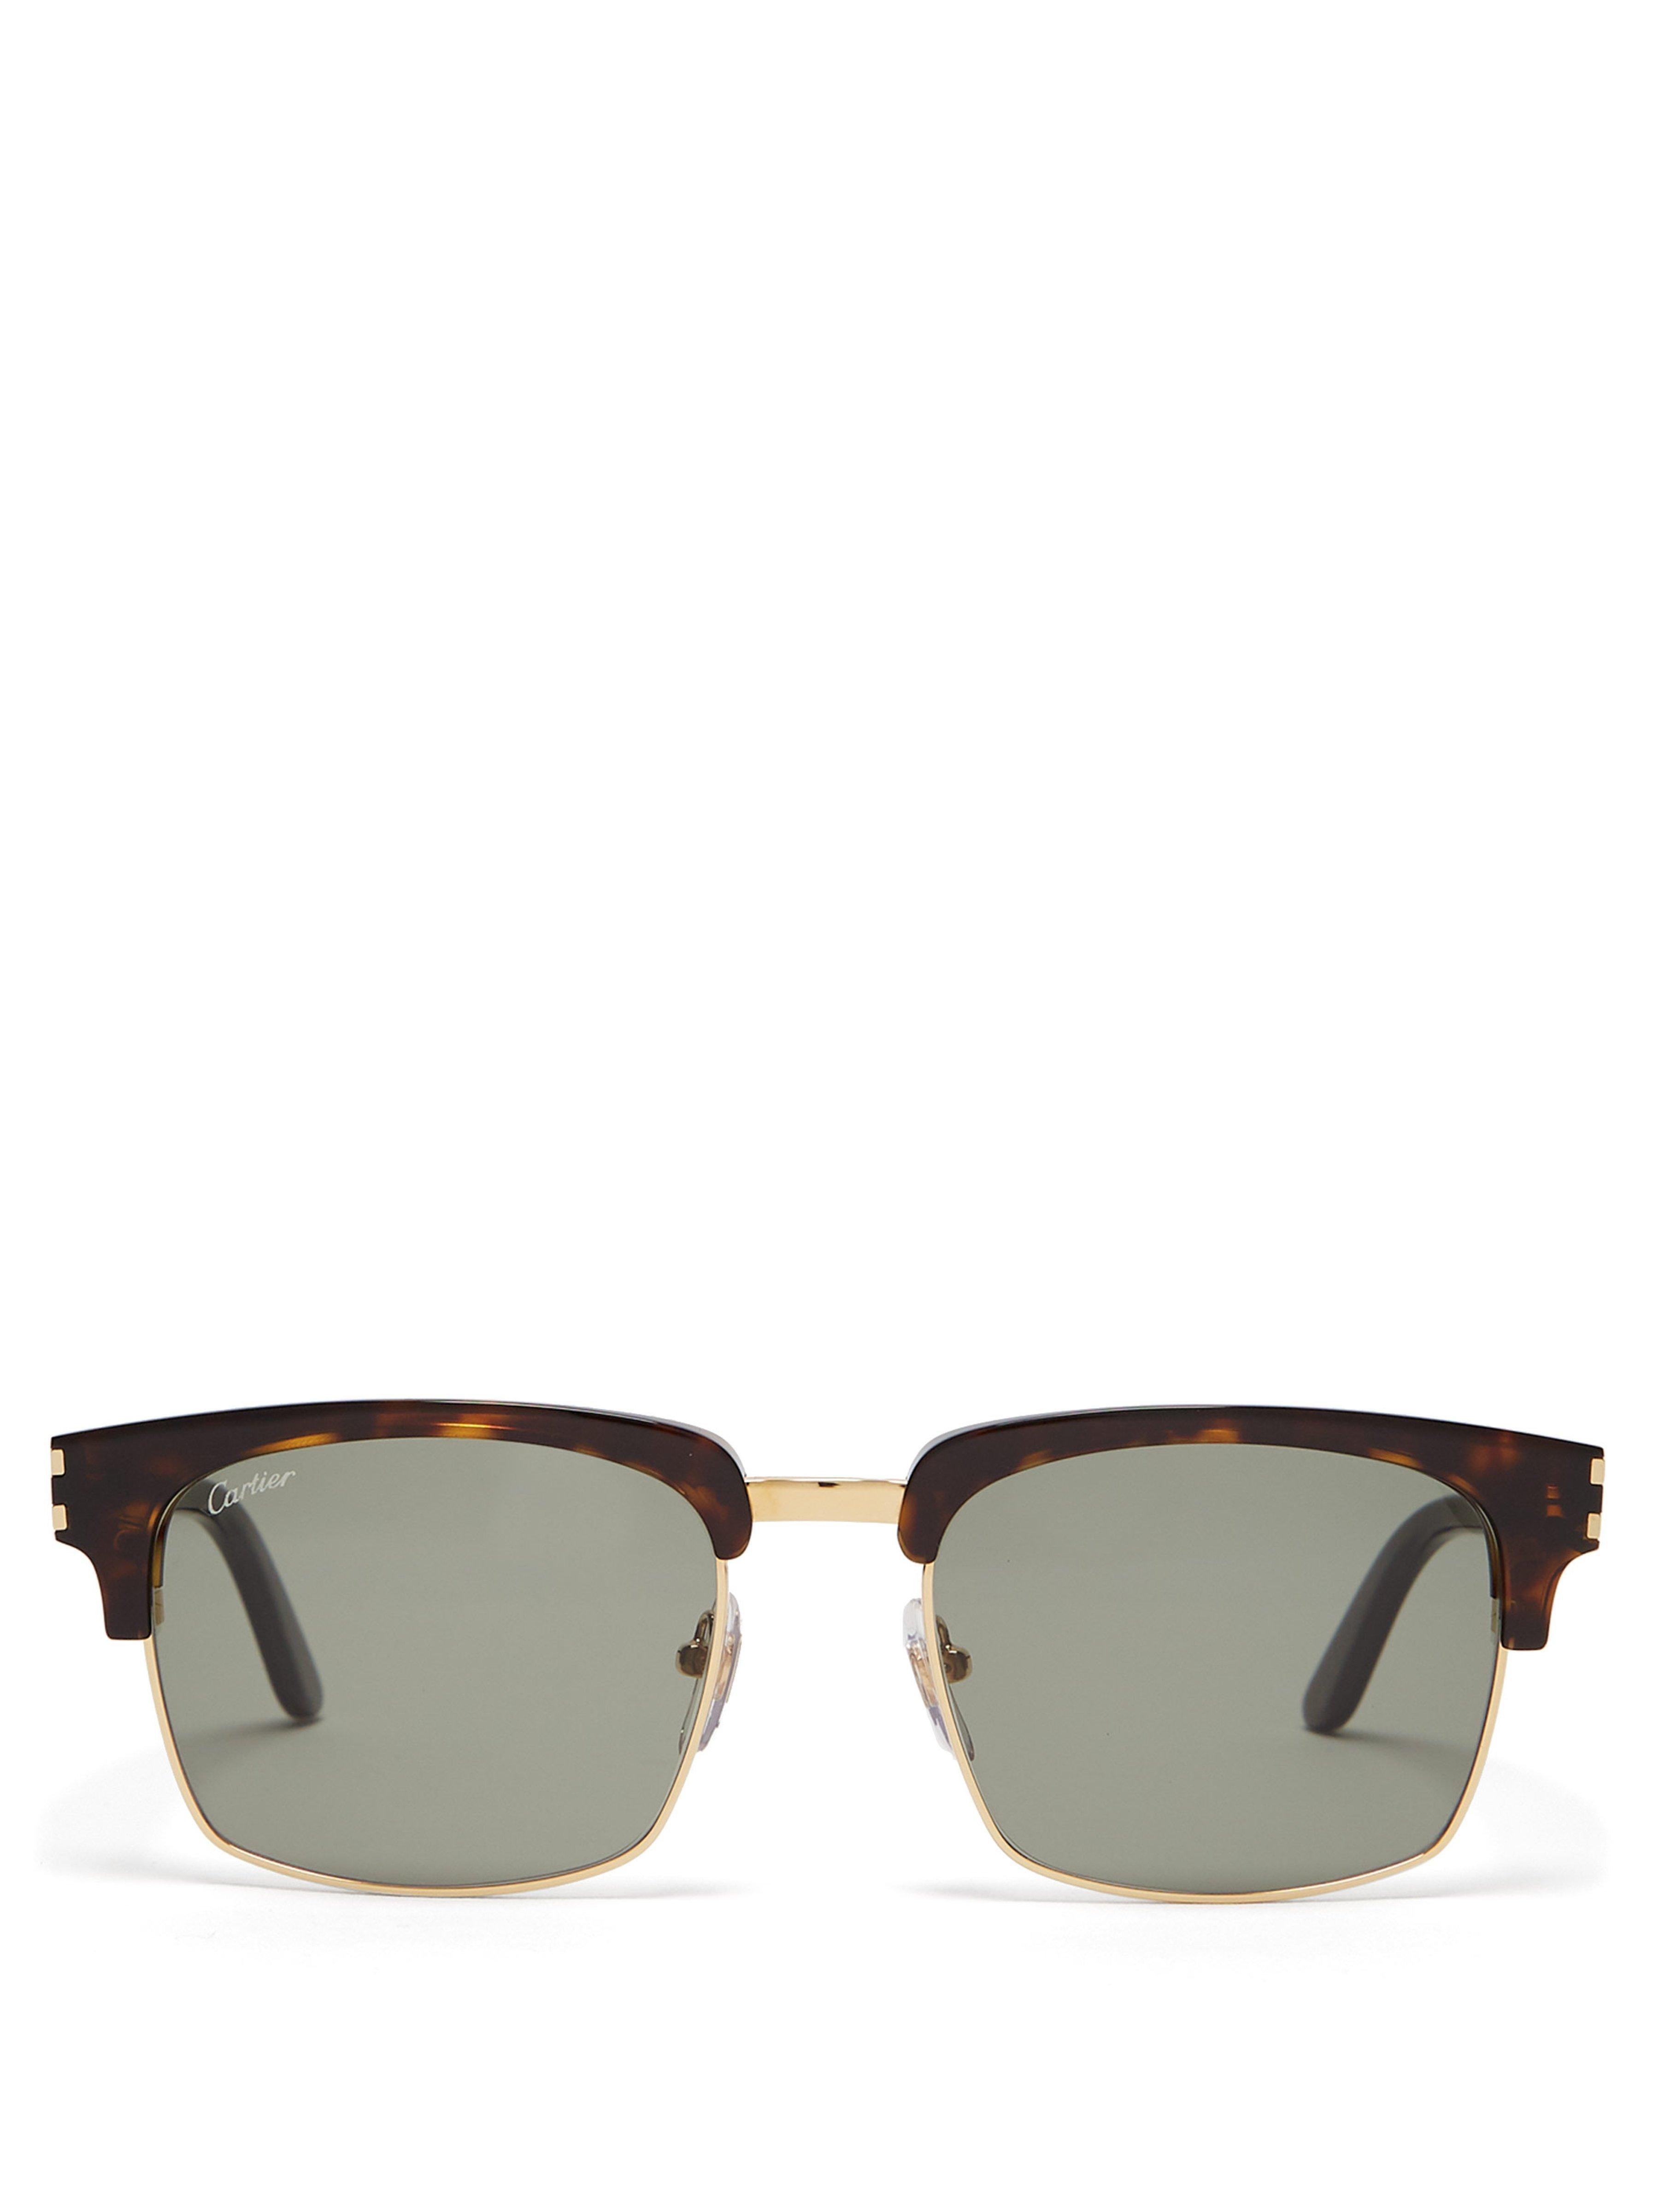 454ad48c48 Cartier - Brown C Décor Square Metal Sunglasses for Men - Lyst. View  fullscreen